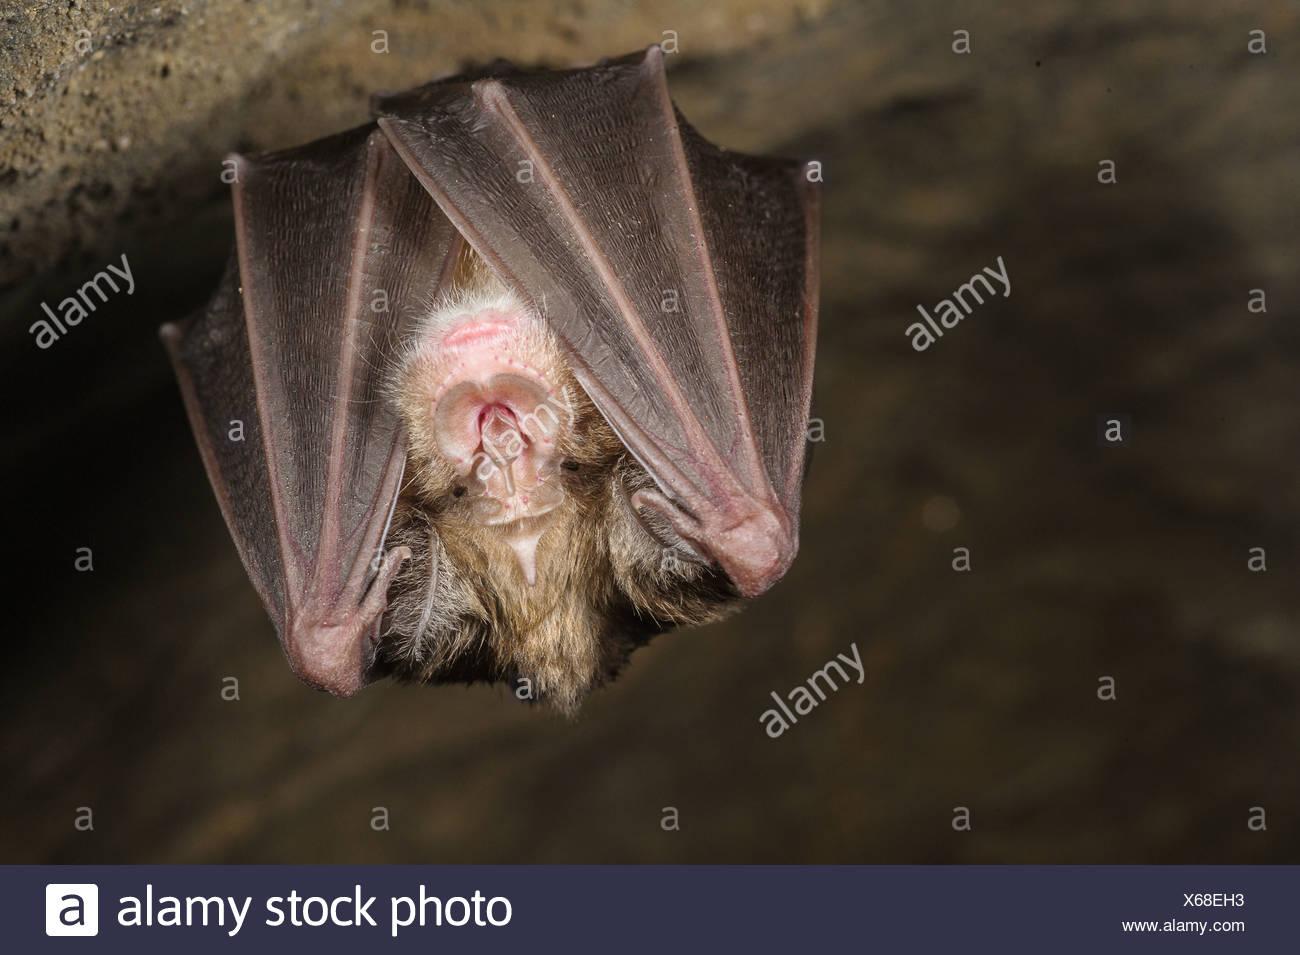 Greater Horseshoe Bat (Rhinolophus ferrumequinum) adult hibernating in cave Grotta dell'Orso Ormea Cuneo Province Piedmont - Stock Image